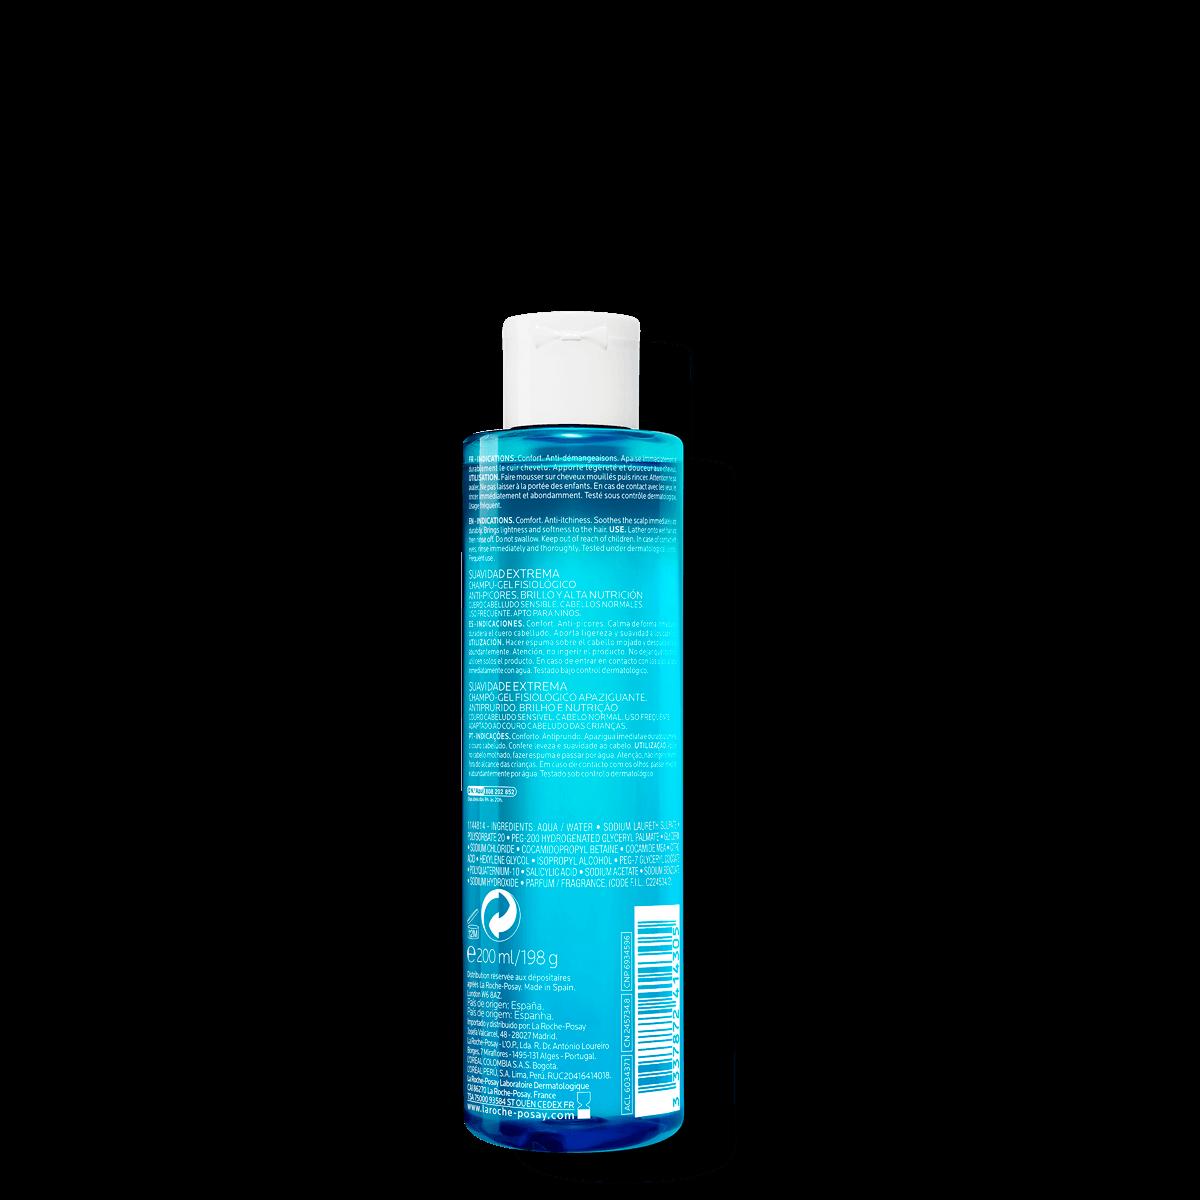 La Roche Posay ProduktSide Kerium Ekstra Nænsom Gelshampoo 200ml 33378